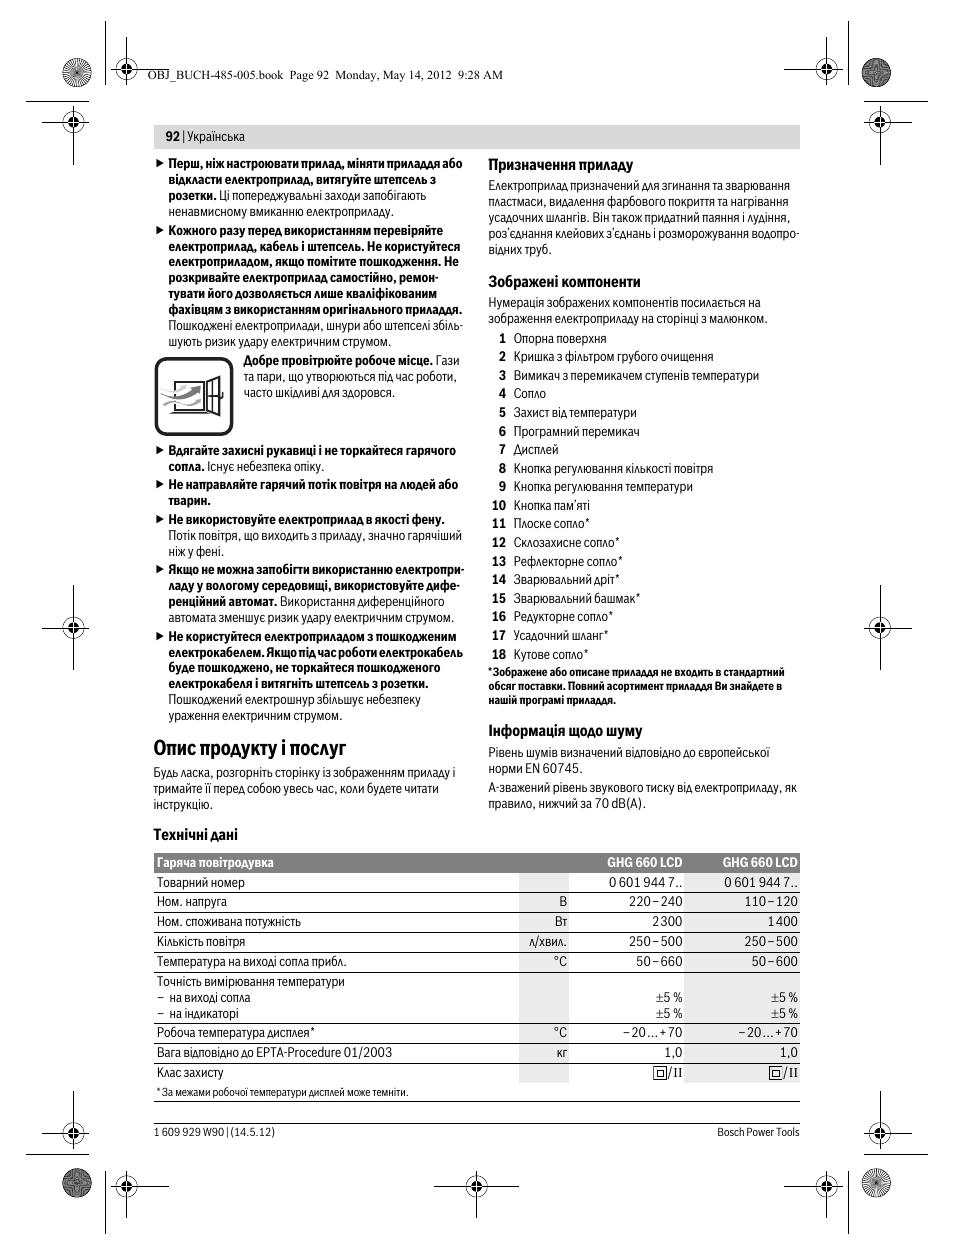 Опис продукту ³ послуг | Bosch GHG 660 LCD Professional User Manual | Page  92 /